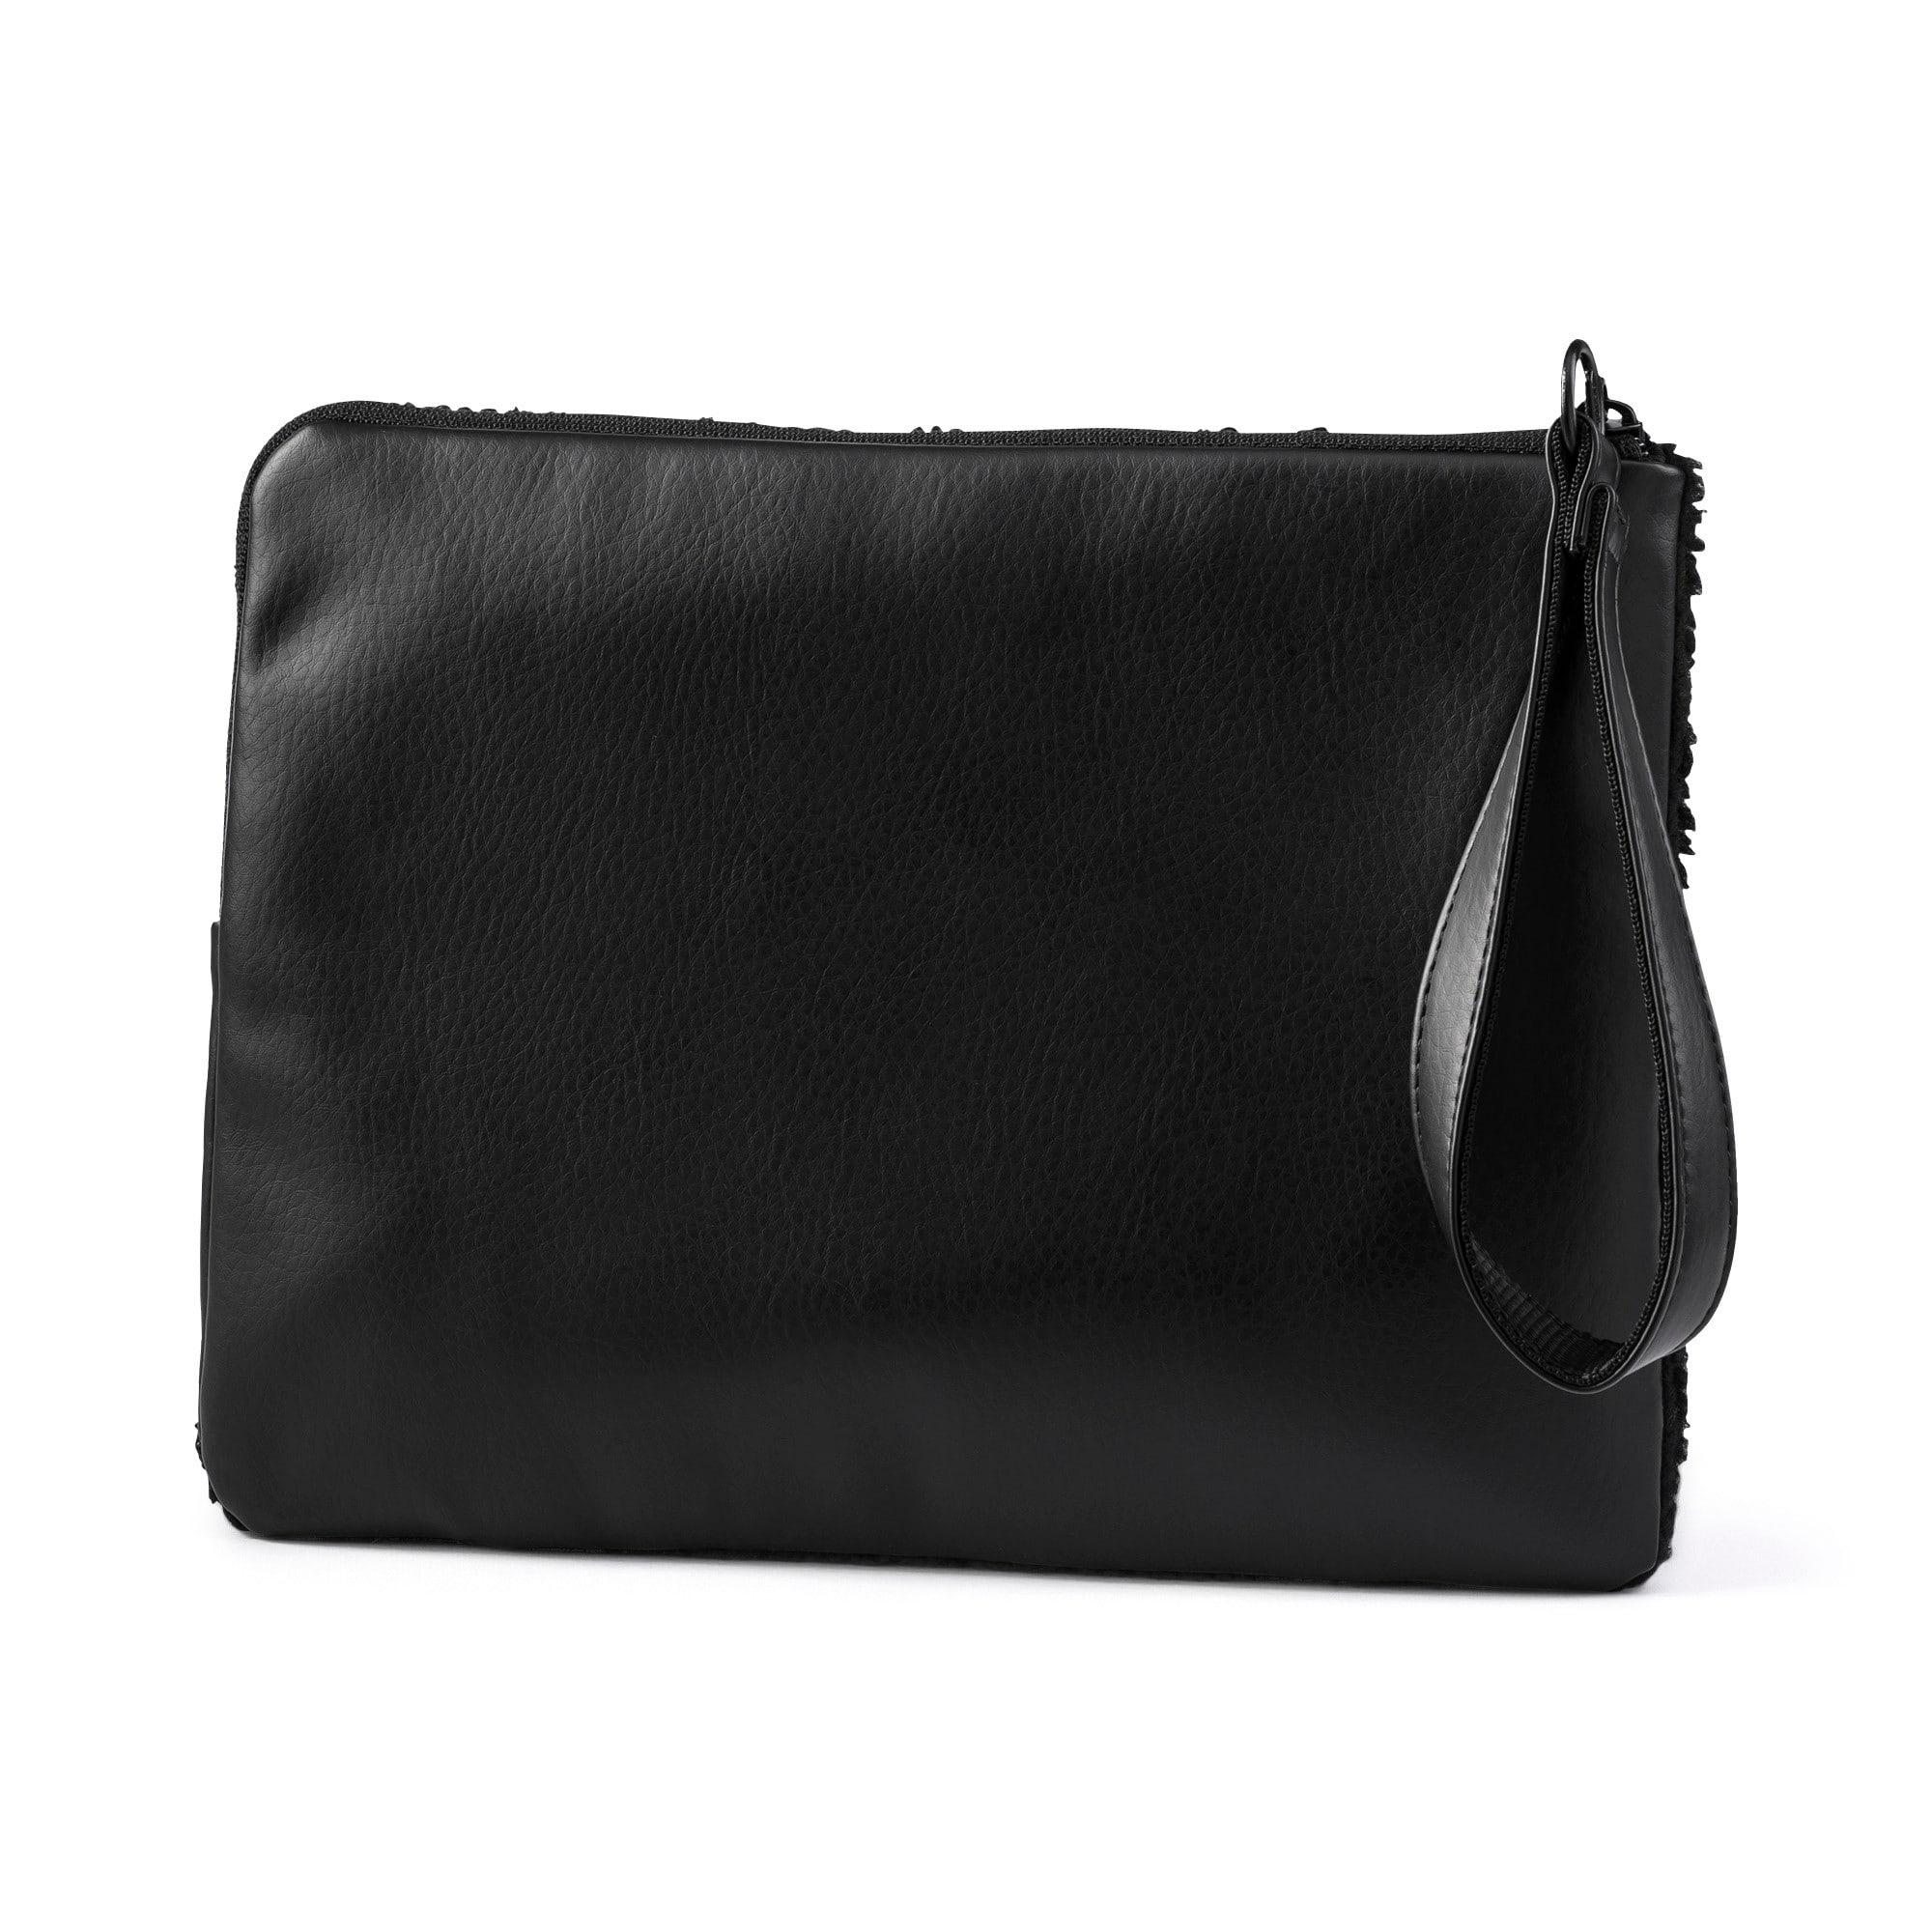 Thumbnail 3 of Prime Time Women's Clutch Bag, Puma Black-Puma Black, medium-IND